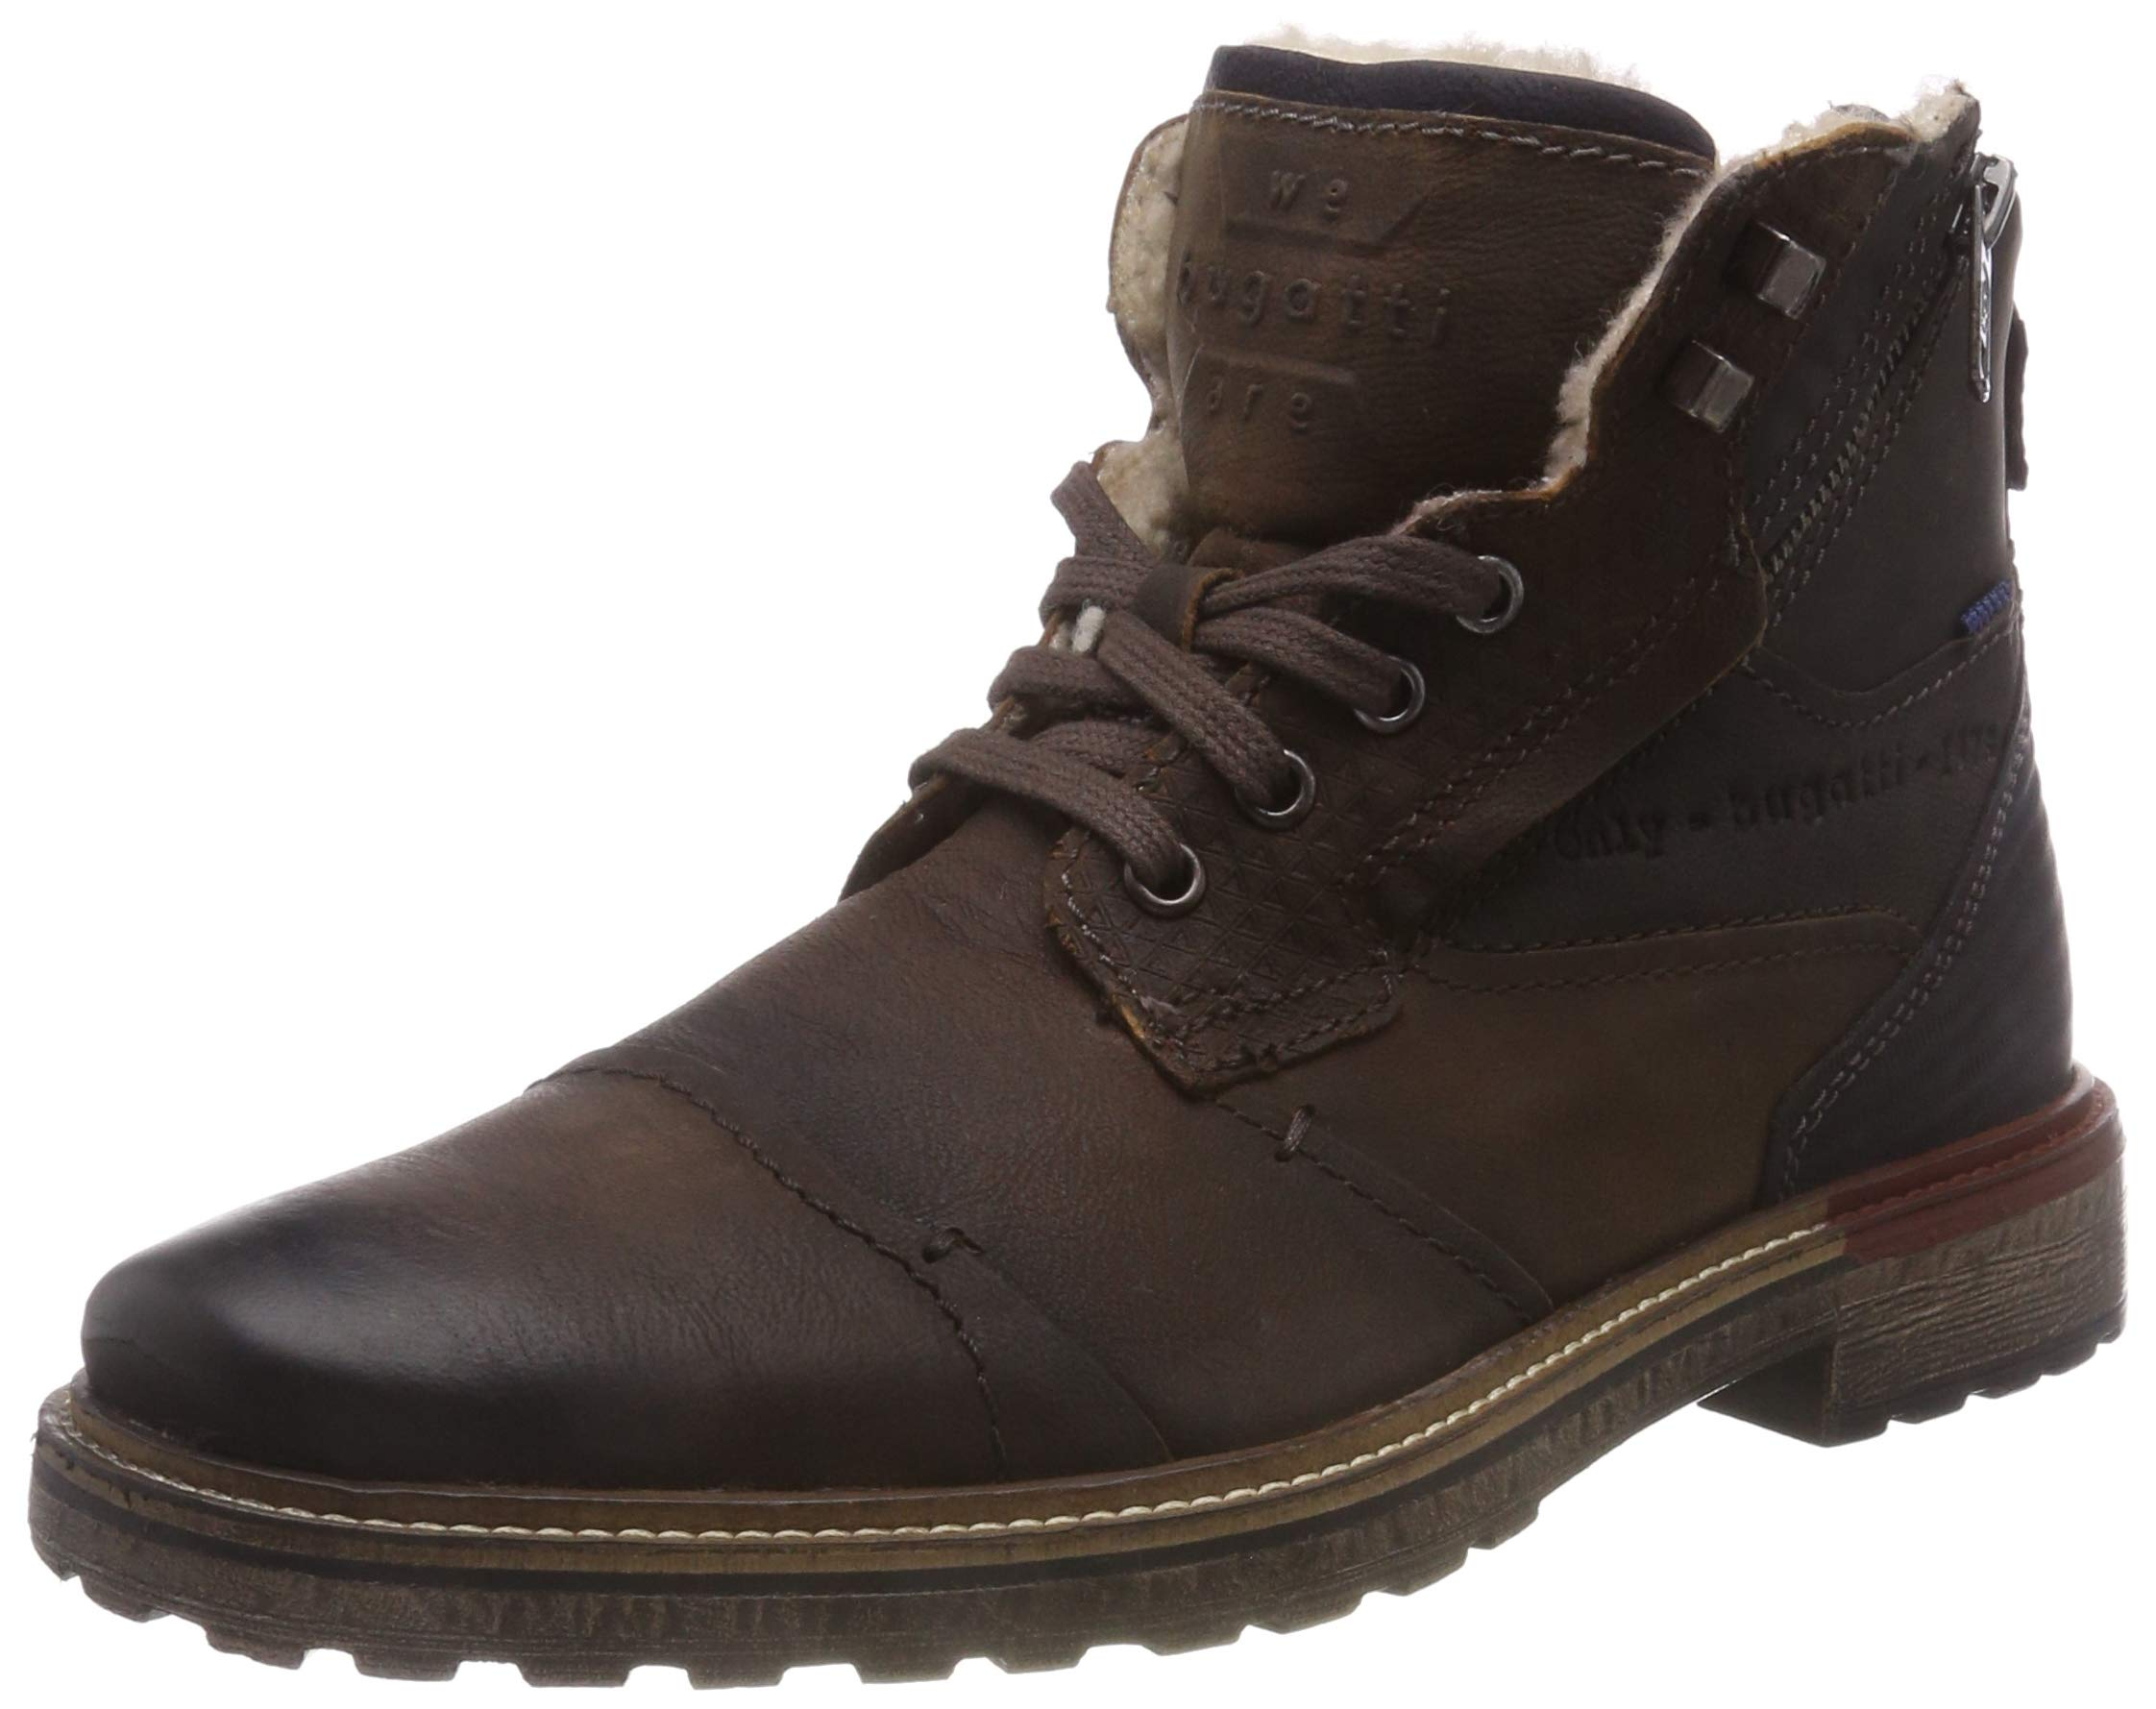 bugatti Herren 311382523200 Klassische Stiefel, Braun, 43 EU MXwX7